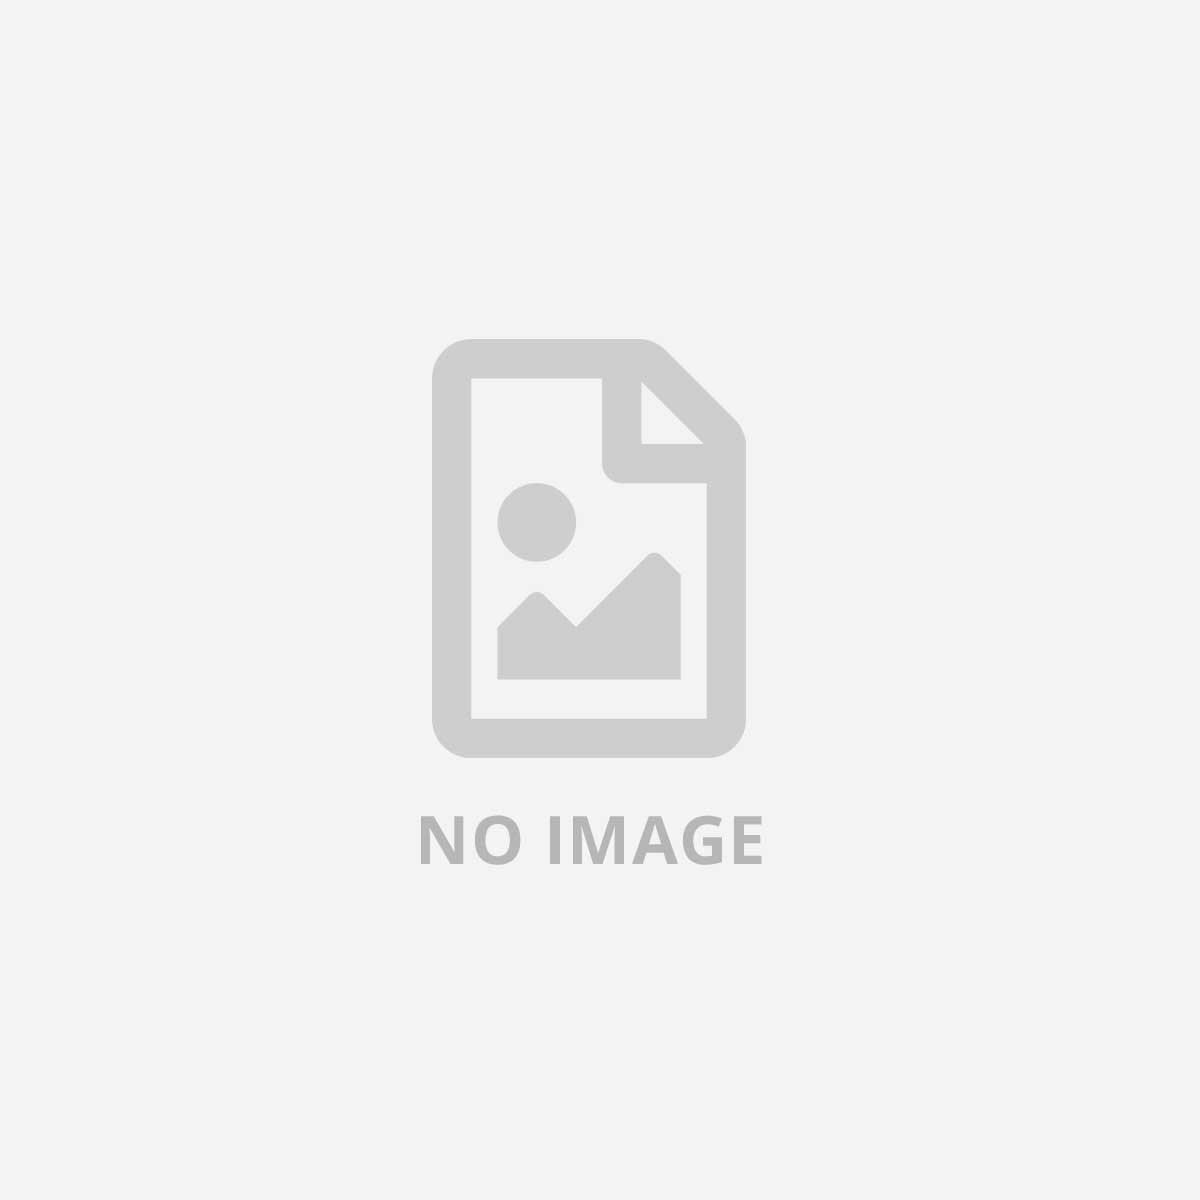 NILOX BOX USB 3.0 2.5P VERDE TRASPARENTE